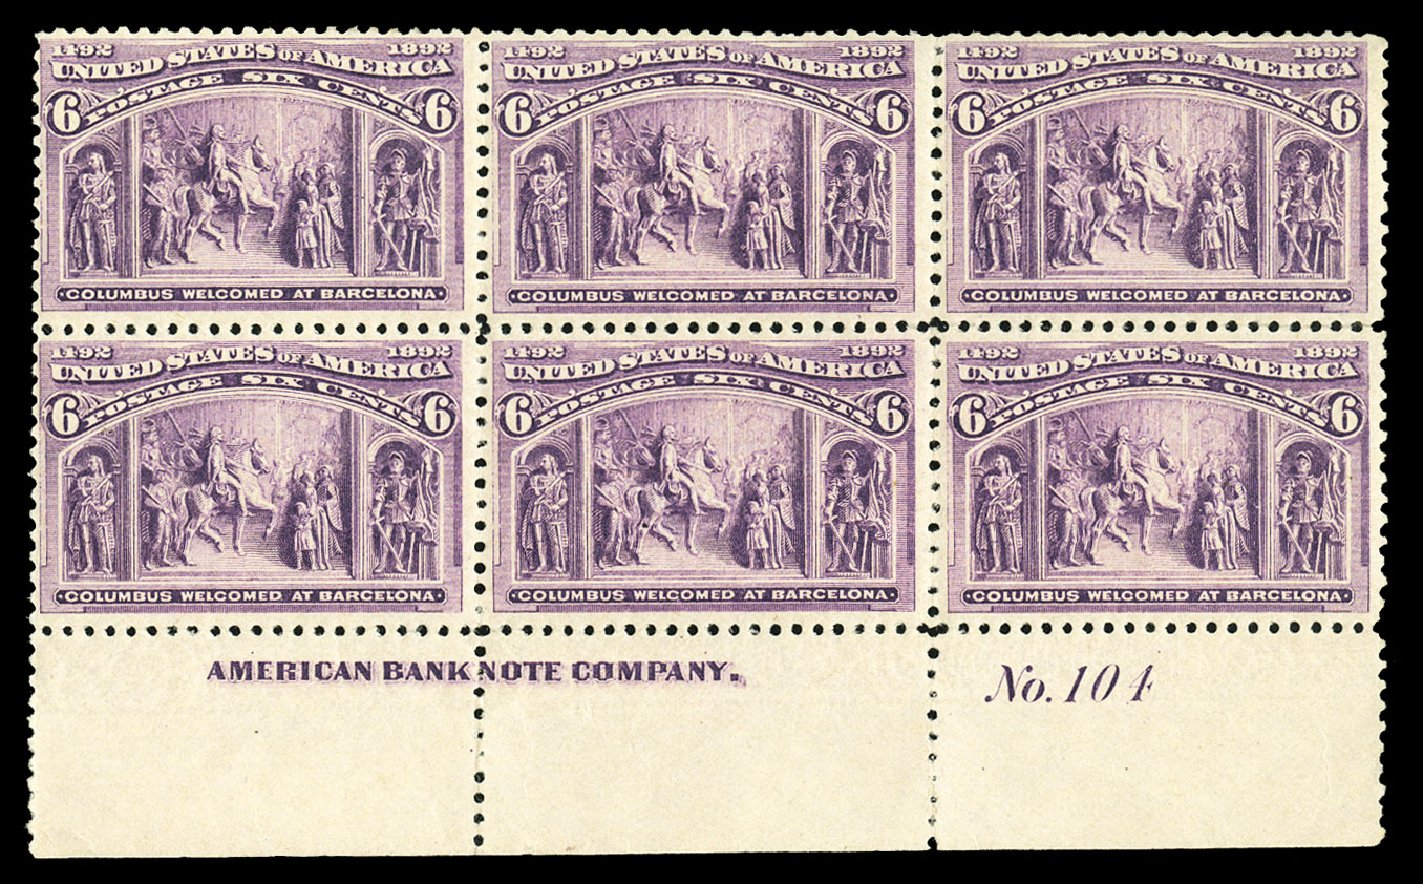 Price of US Stamp Scott Catalog 235: 6c 1893 Columbian Exposition. Cherrystone Auctions, Jul 2015, Sale 201507, Lot 2085